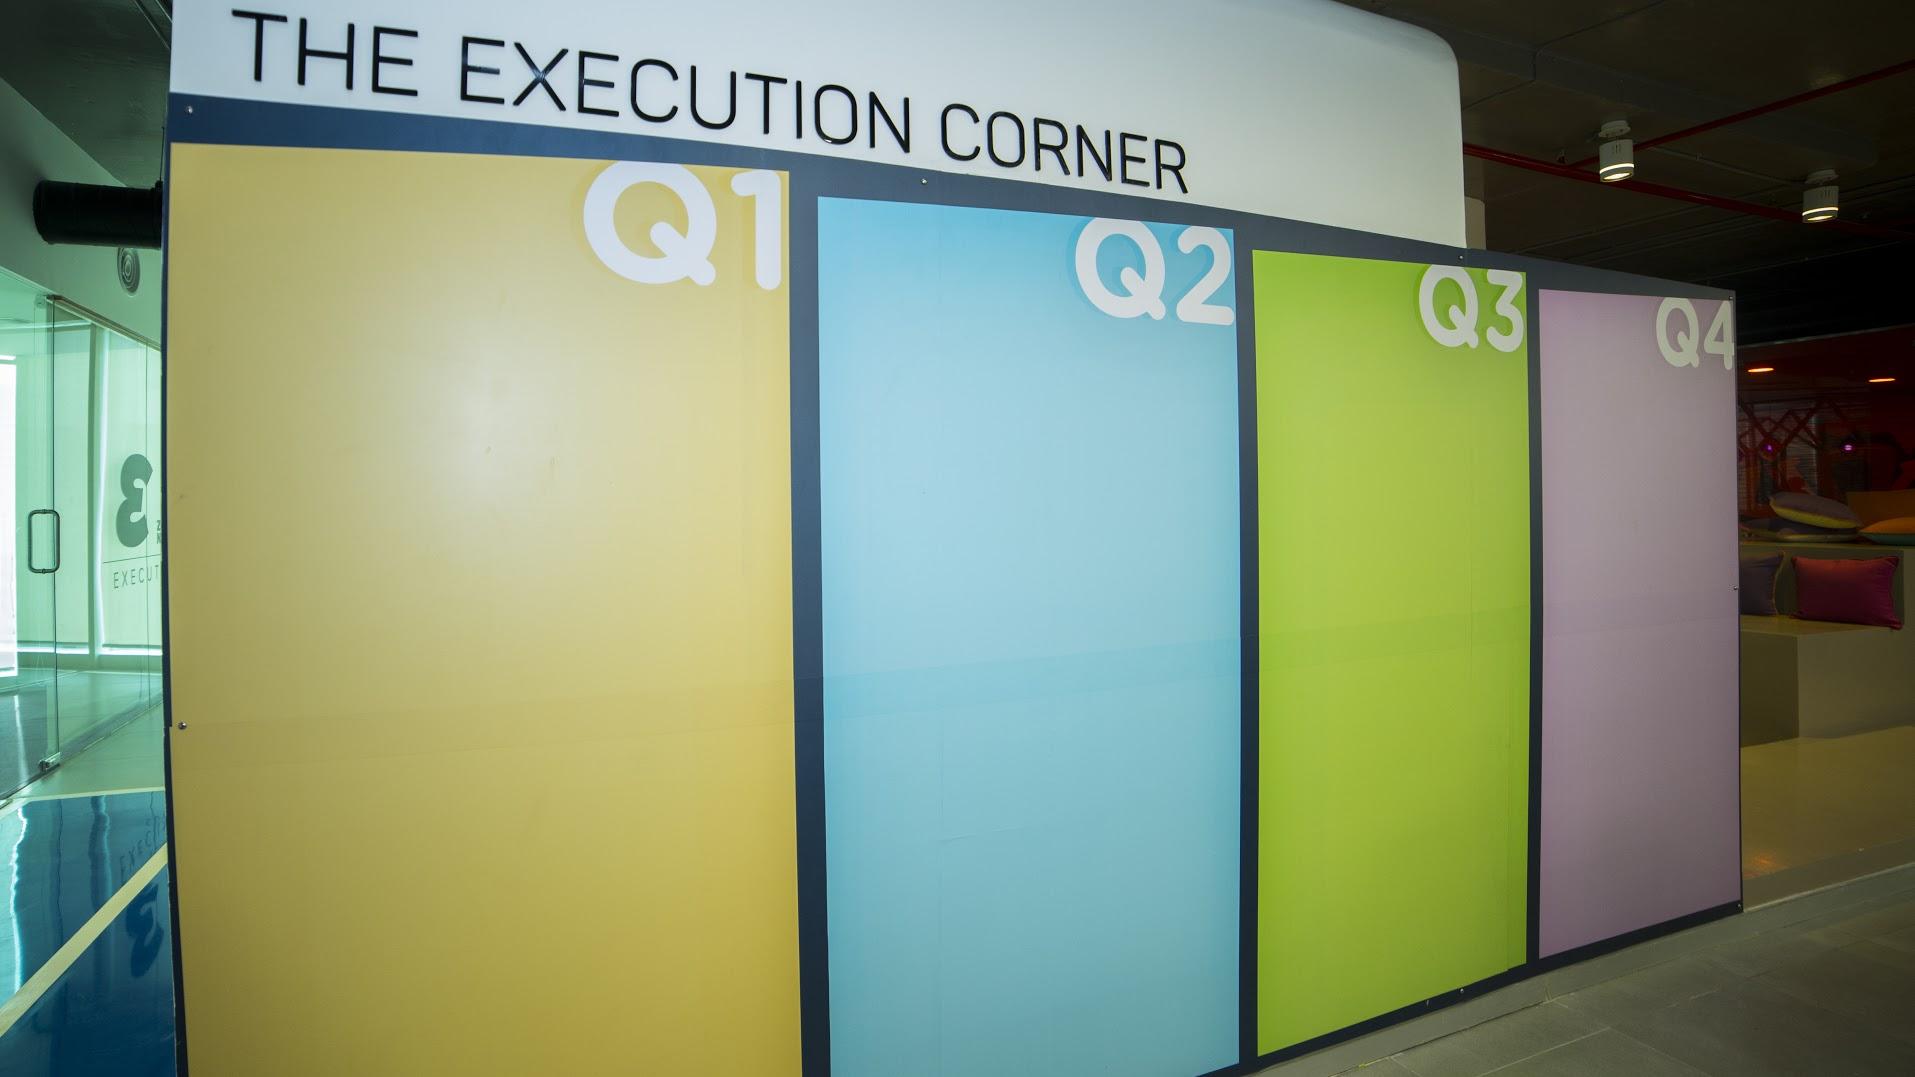 The Execution Corner